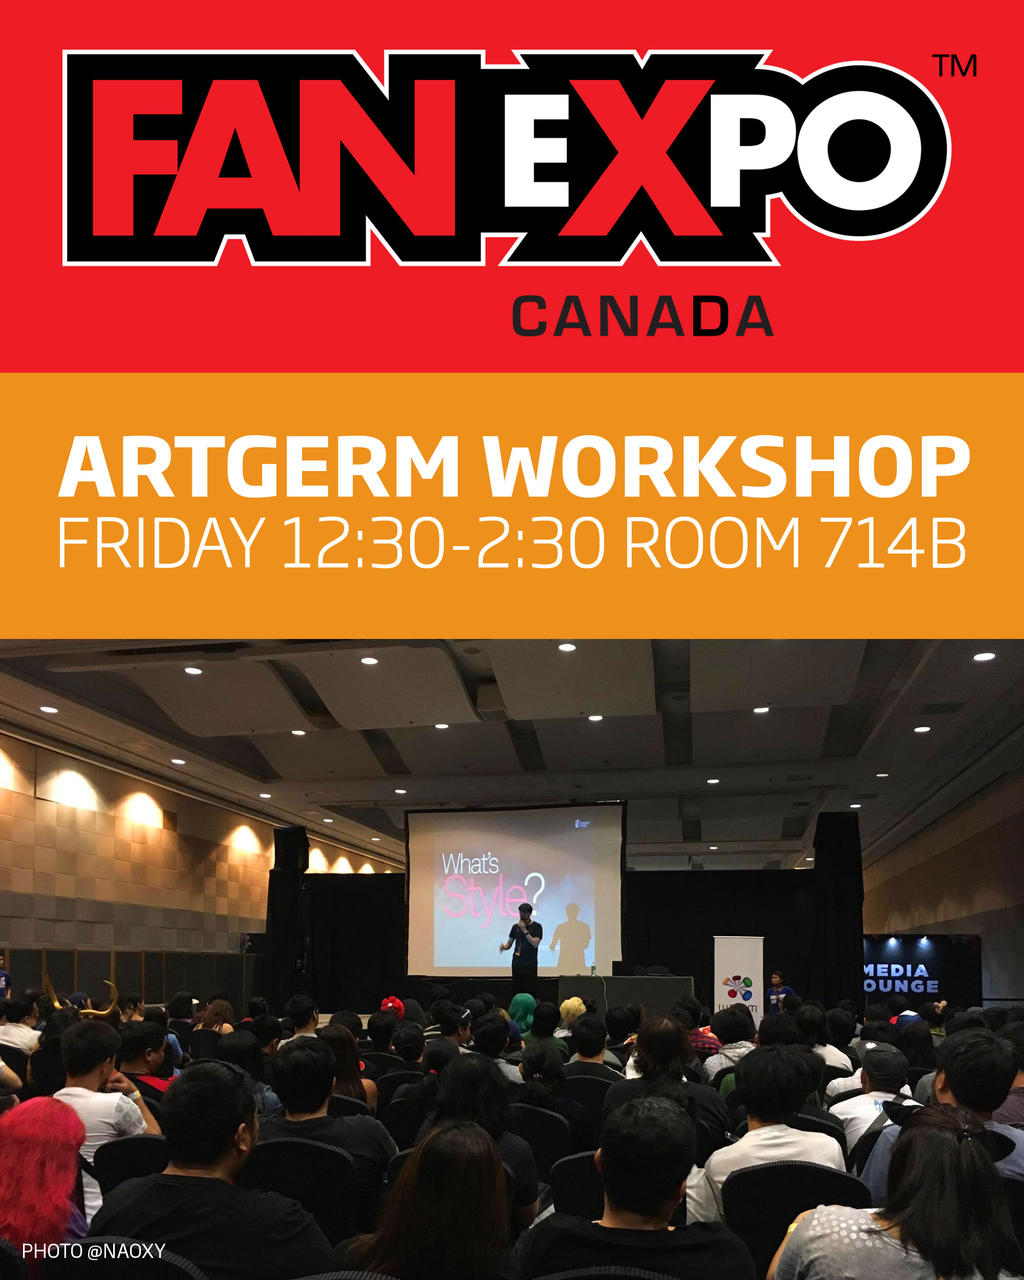 FanExpo workshop